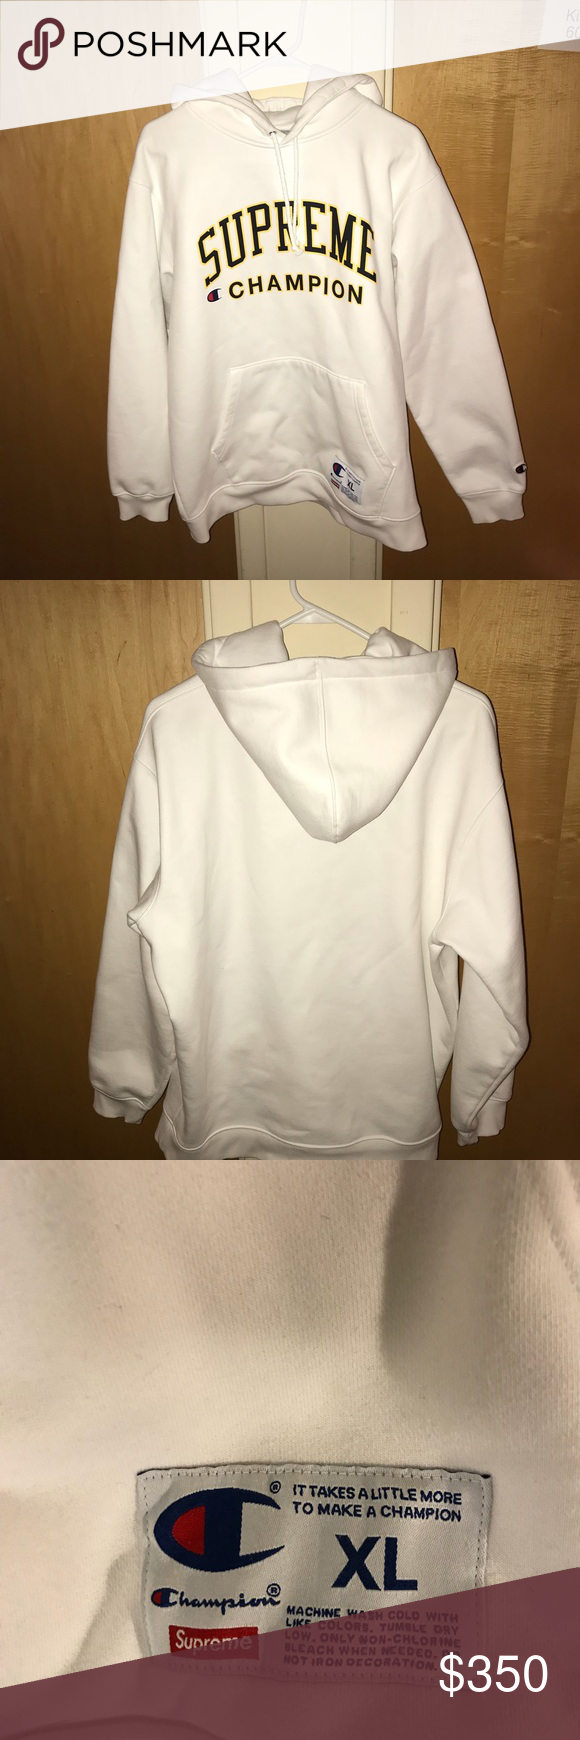 Supreme X Champion Hooded Sweatshirt White Champion Hooded Sweatshirt Hooded Sweatshirts White Sweatshirt [ 1740 x 580 Pixel ]